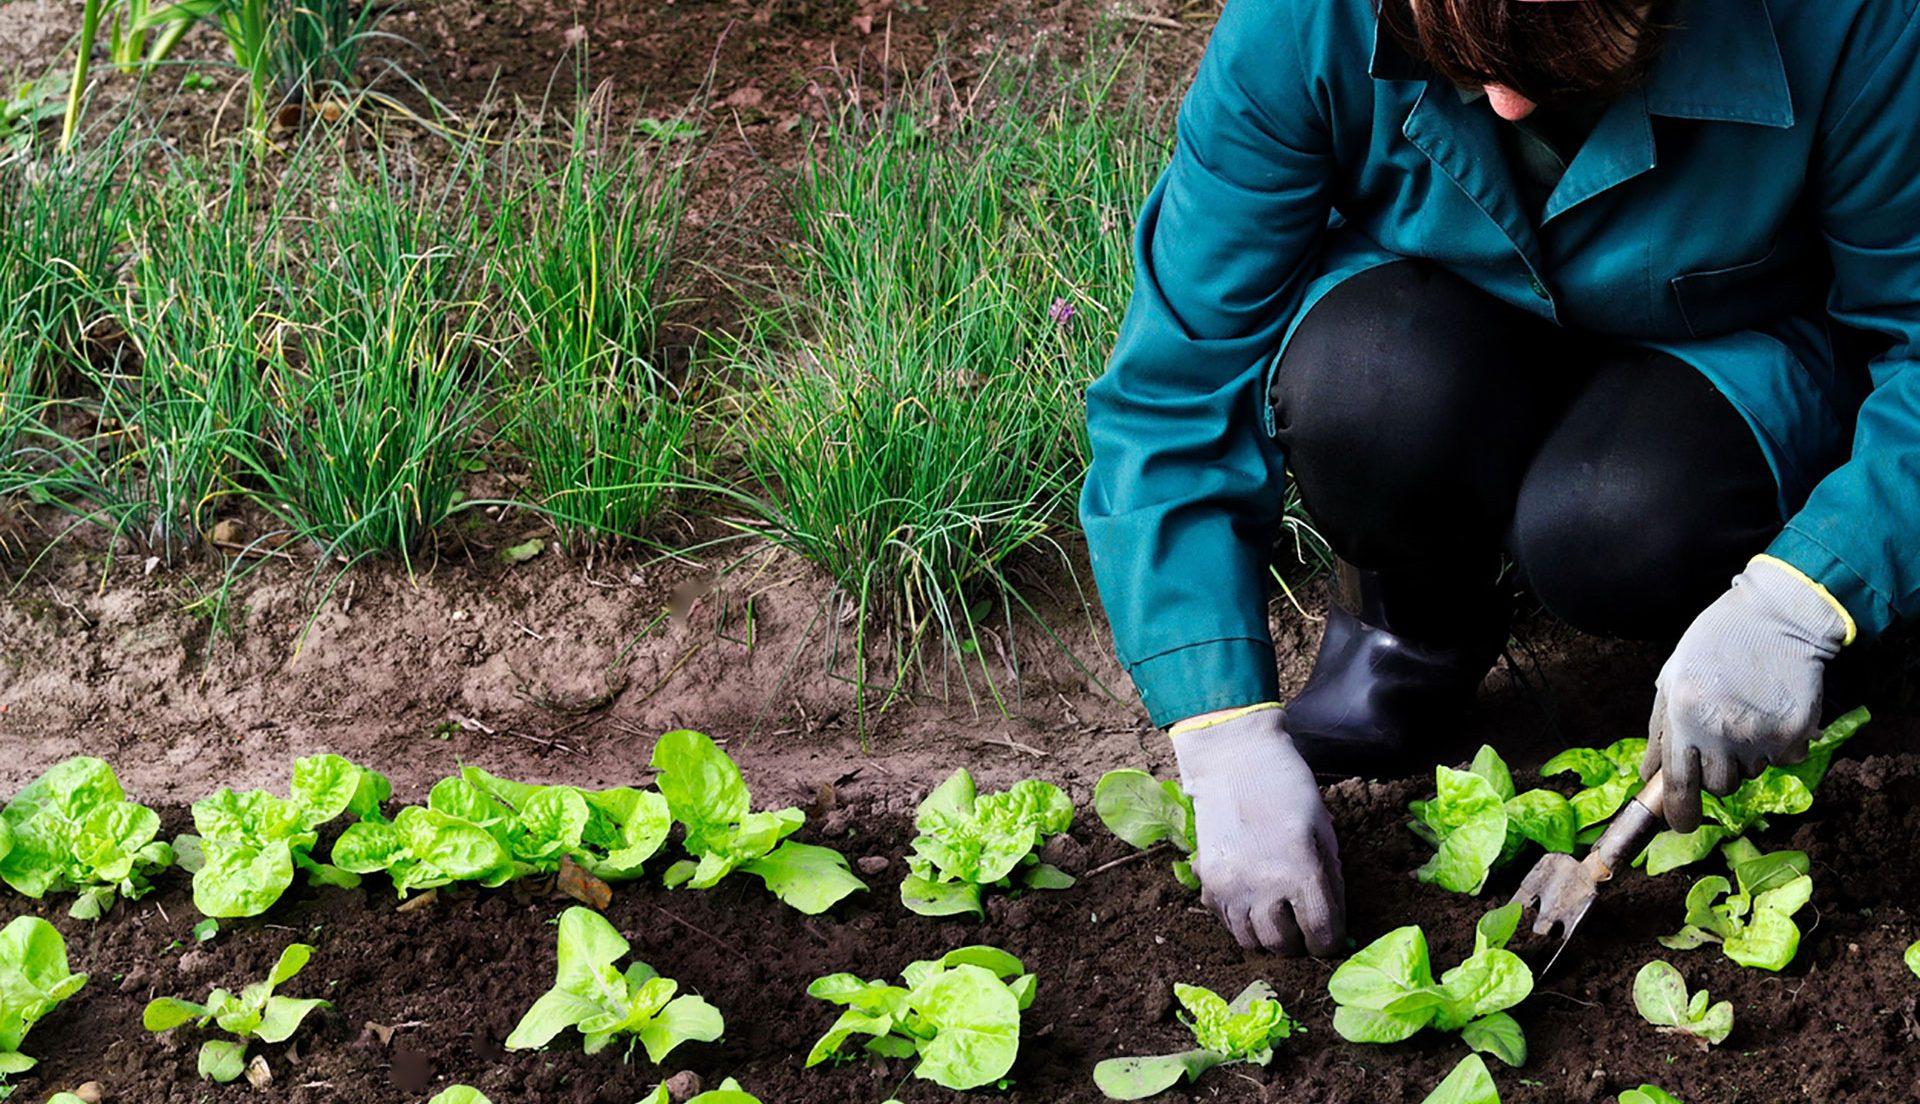 Requisitos para la agricultura ecologica